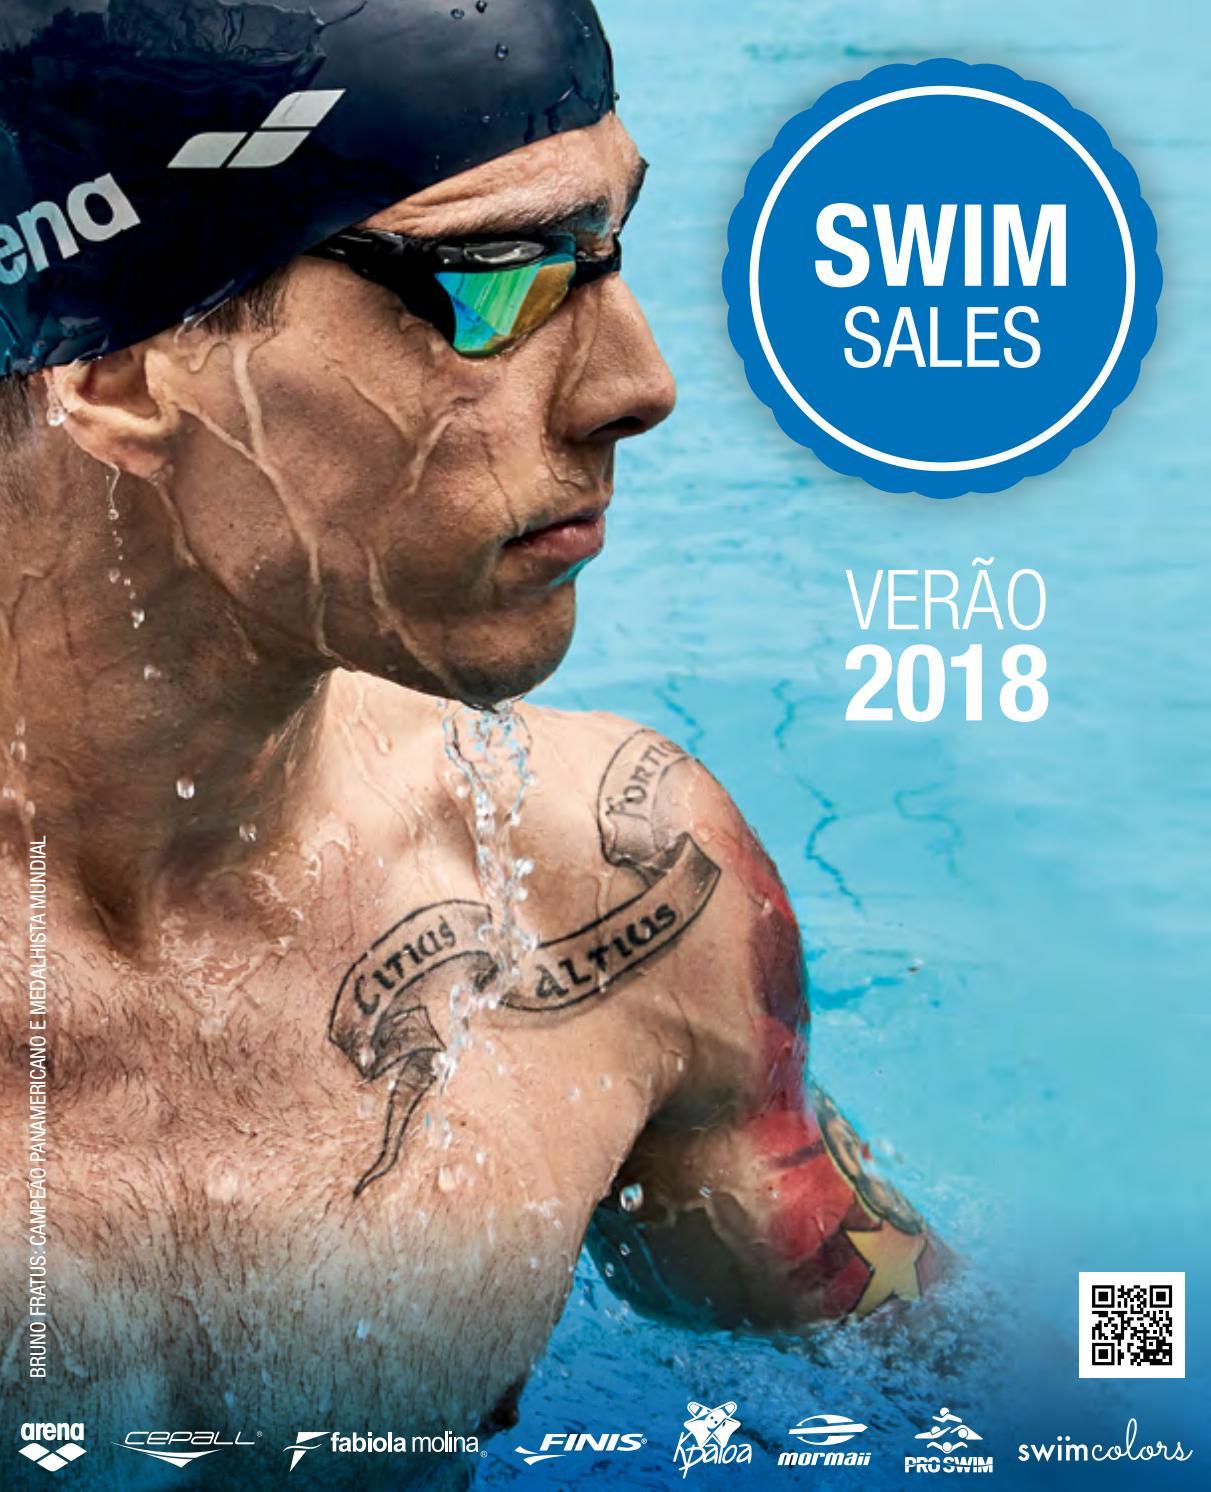 74895f39a Swim Sales 2018 by Natalia Marrache - issuu